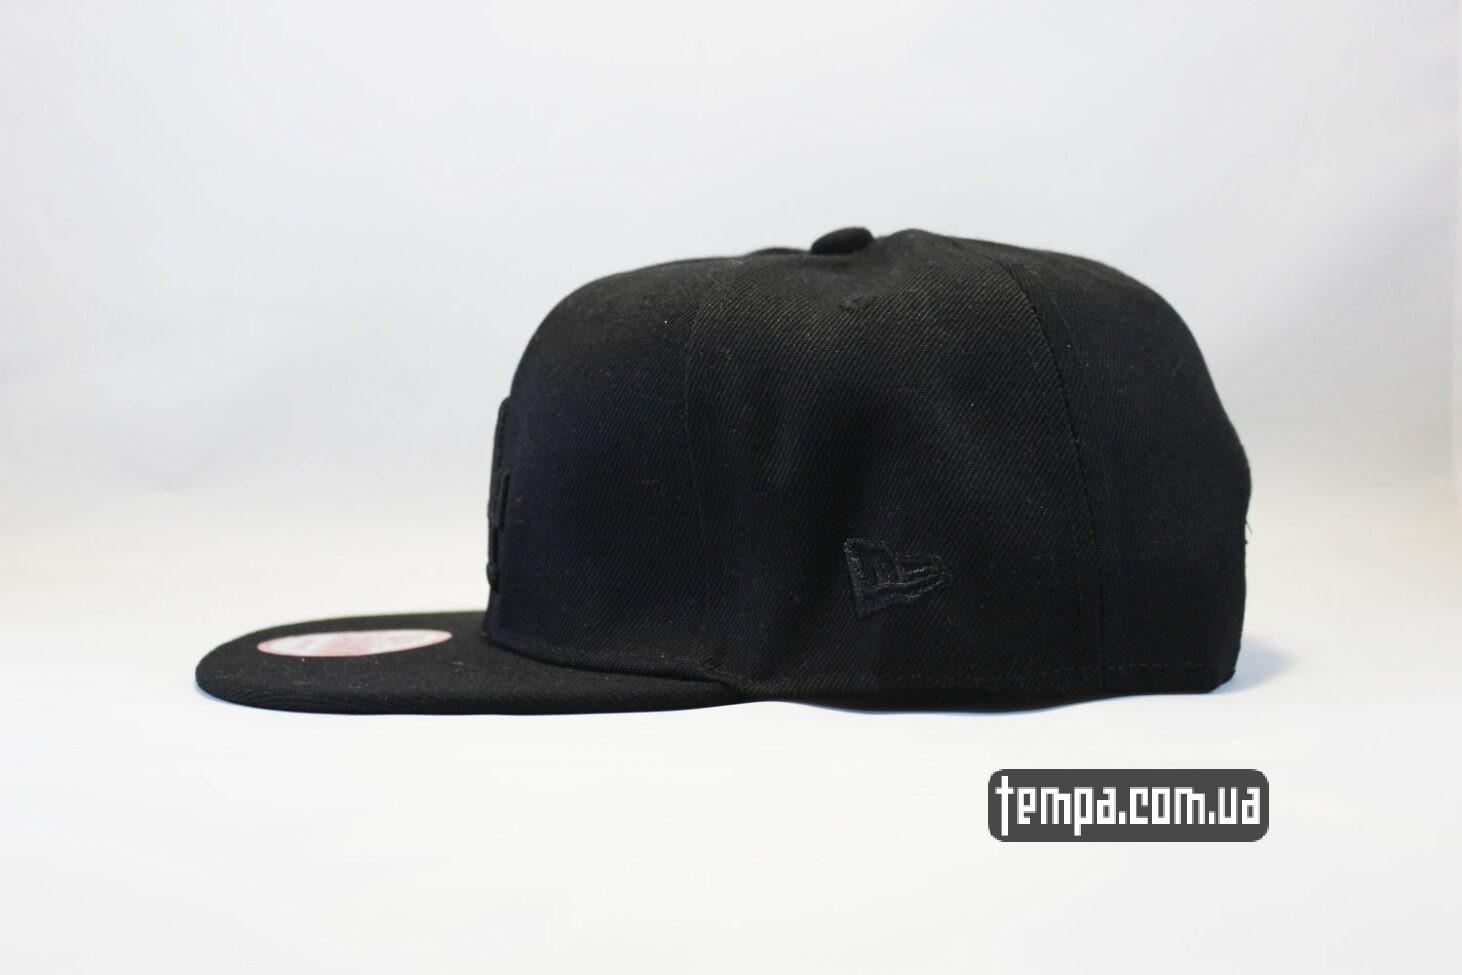 лос анджелес кепка snapback LA Los Angeles New Era 9fifty черная на черном